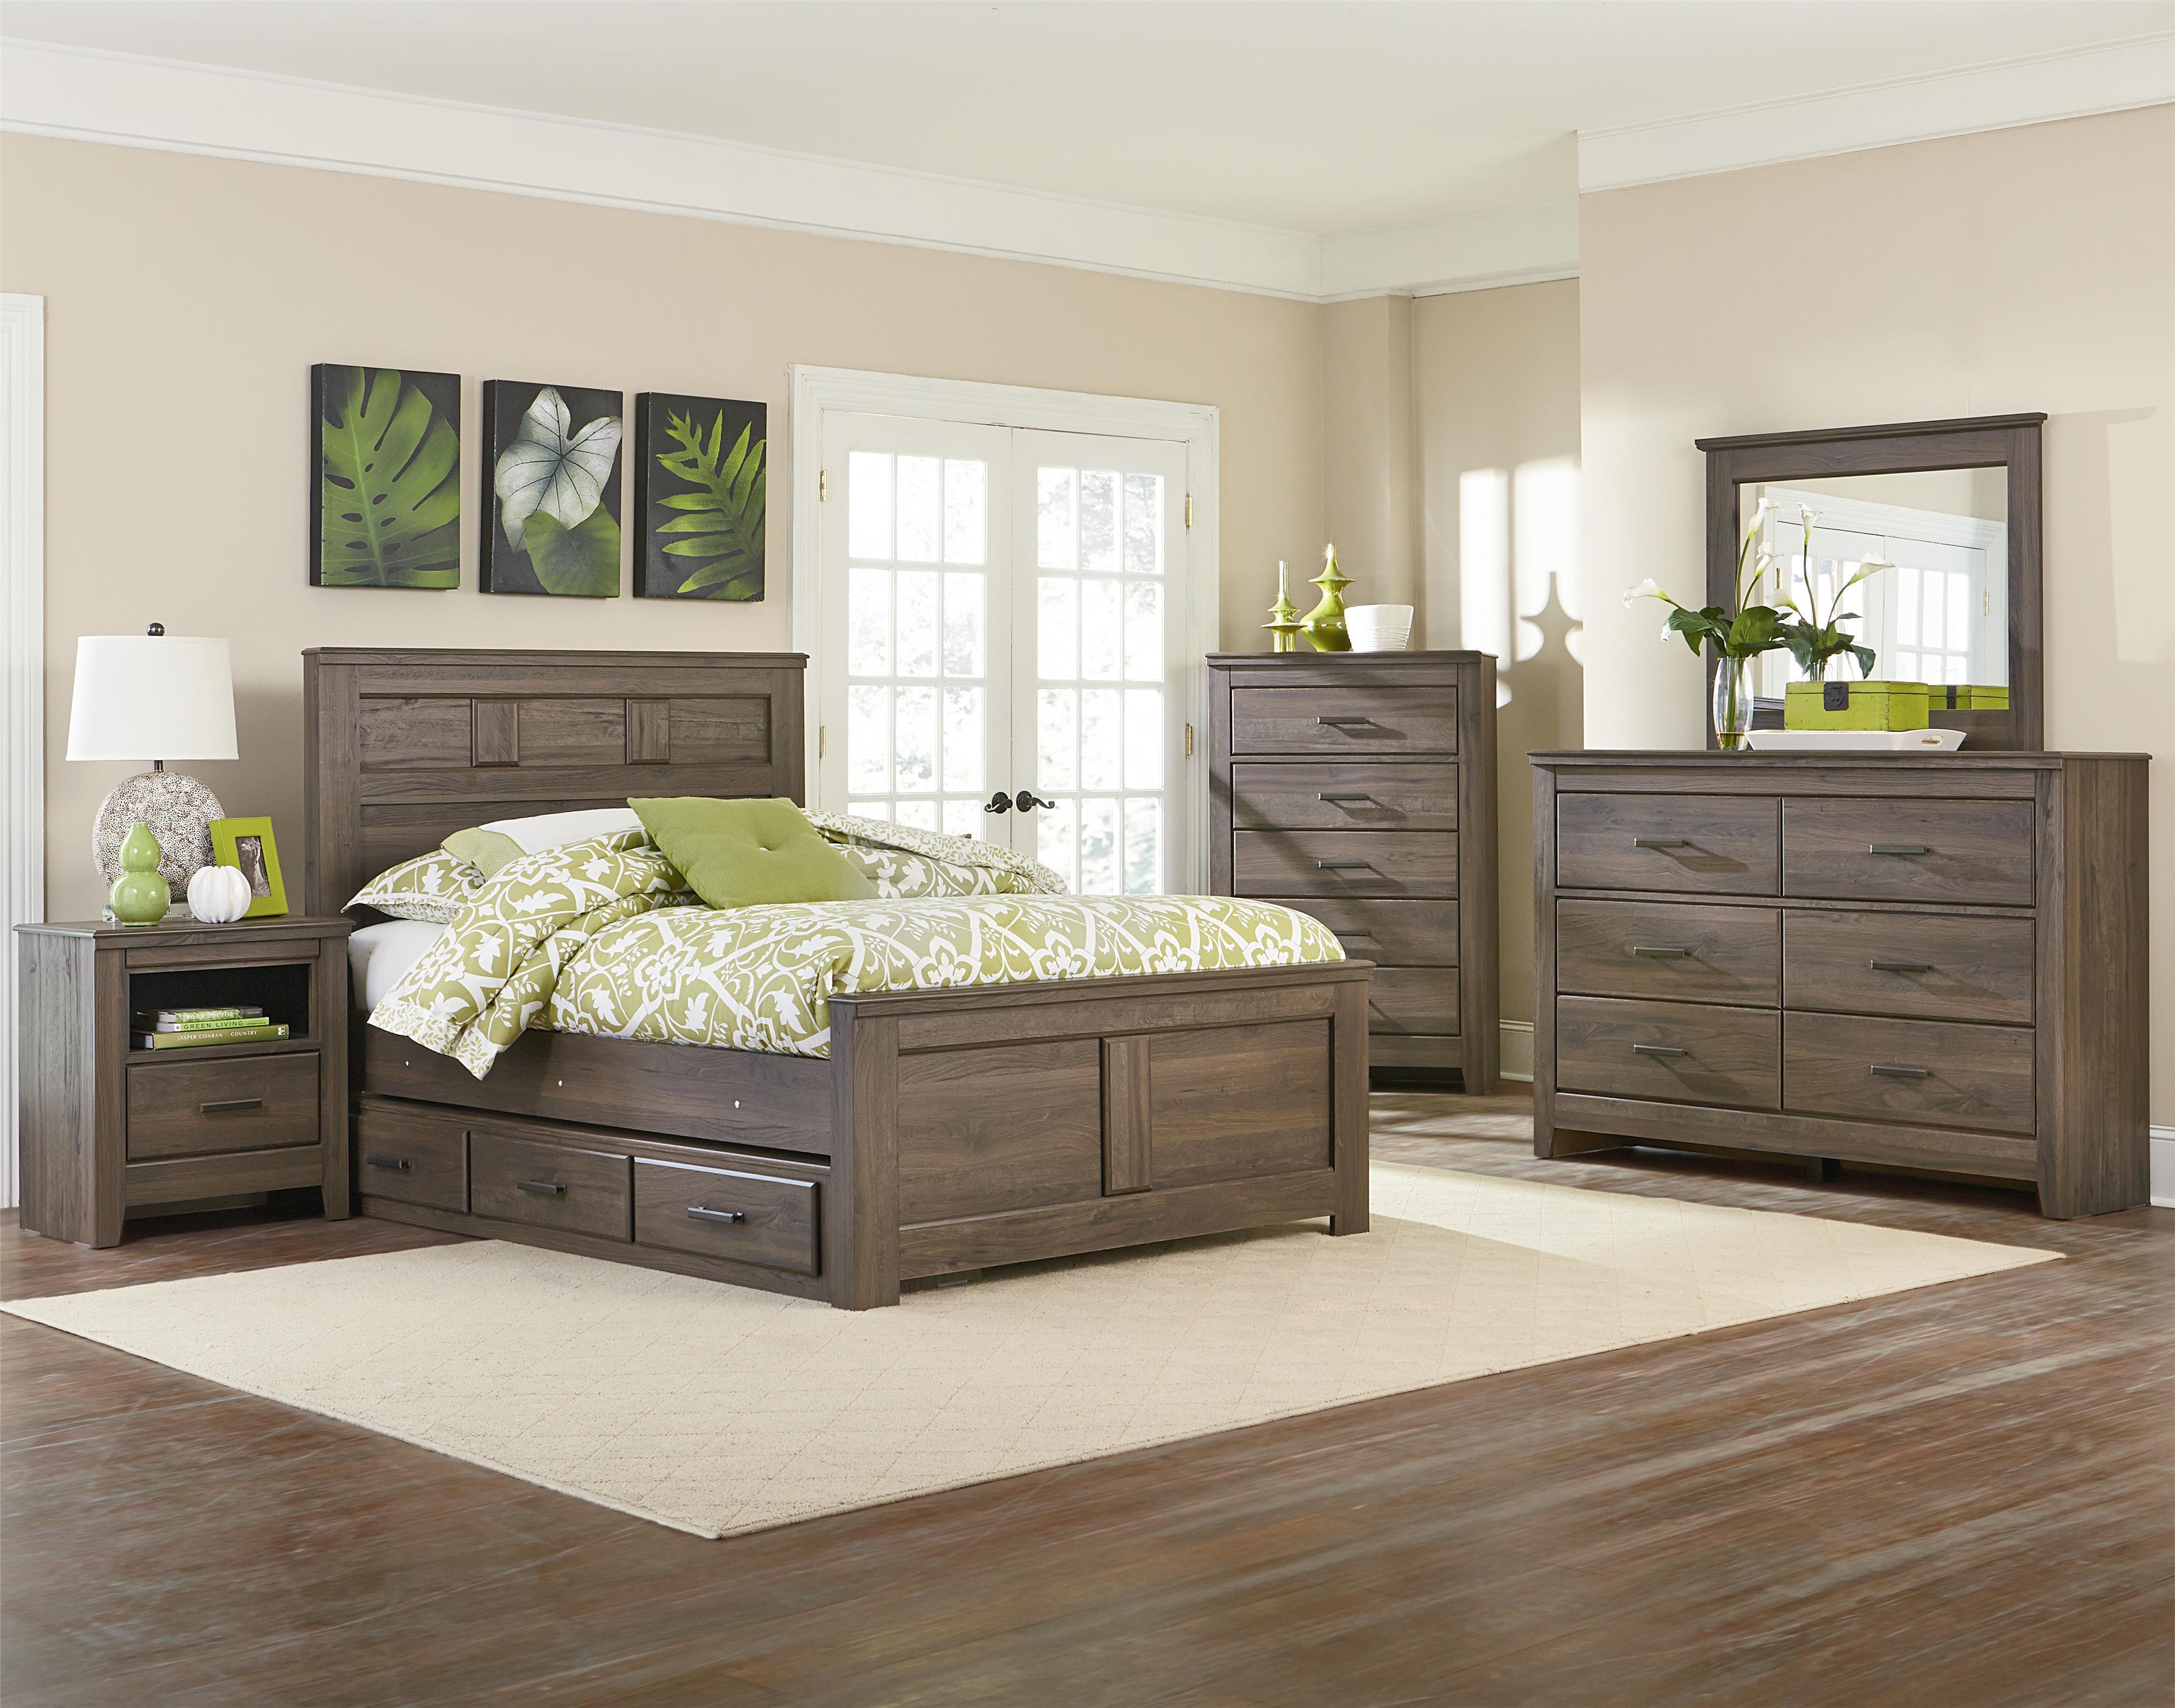 Standard Furniture Hayward Full Bedroom Group - Item Number: 56510 F Bedroom Group 4